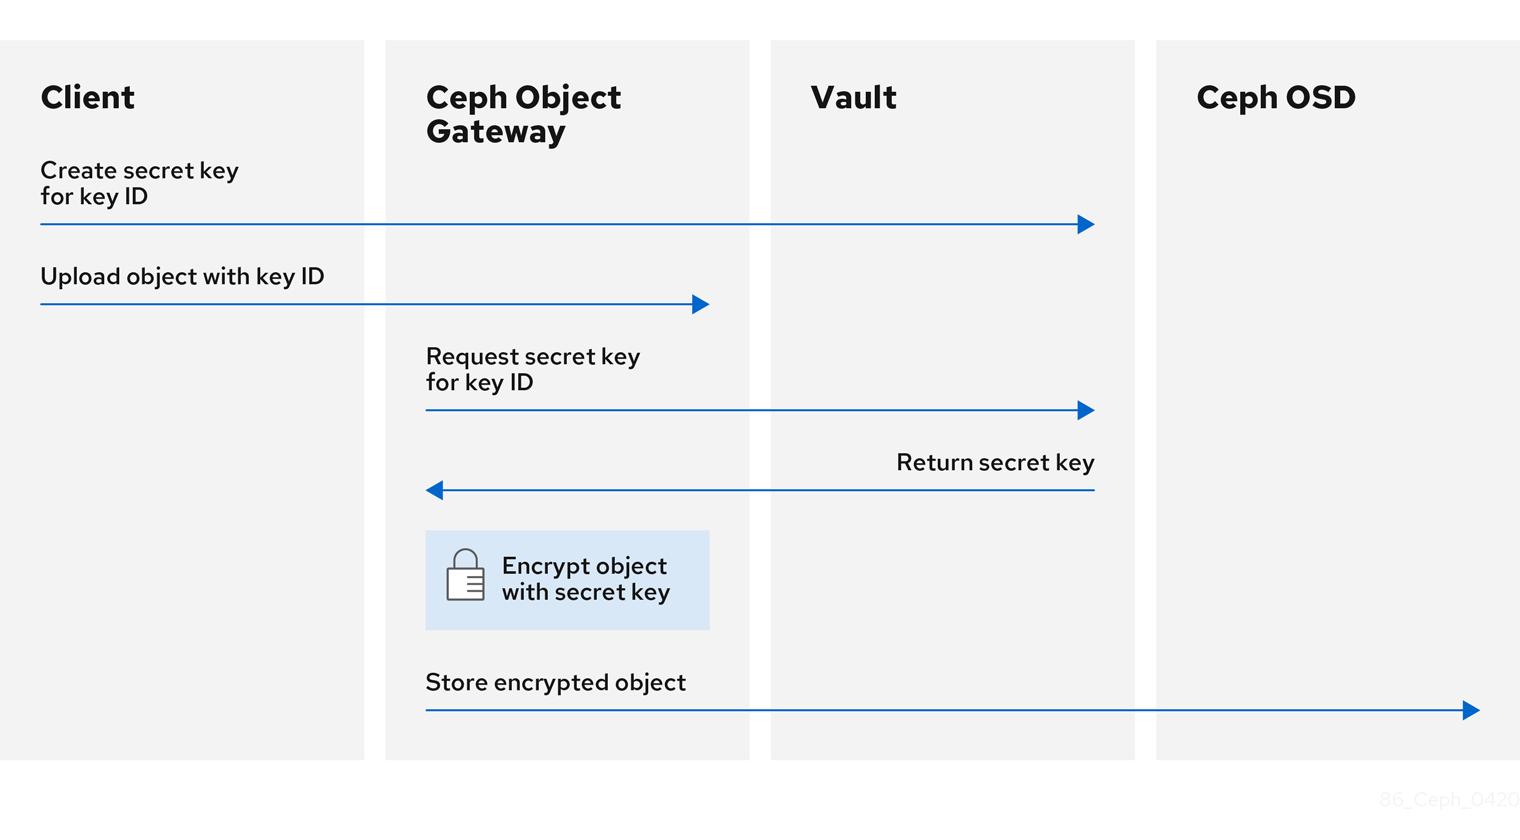 Ceph Vault Integration Diagram